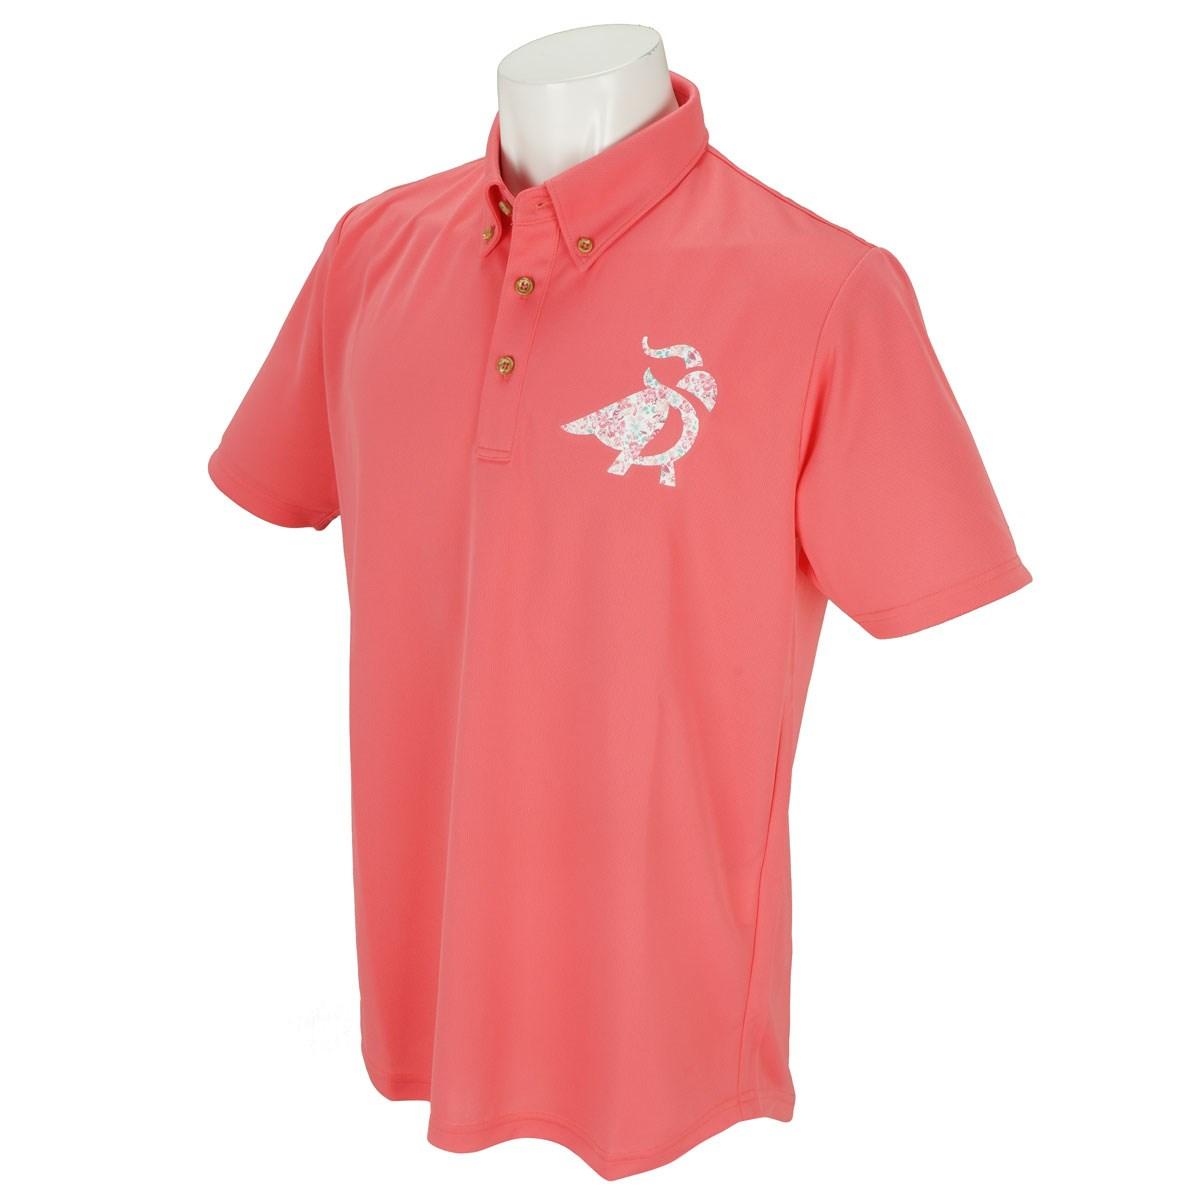 GDO限定 半袖ポロシャツ